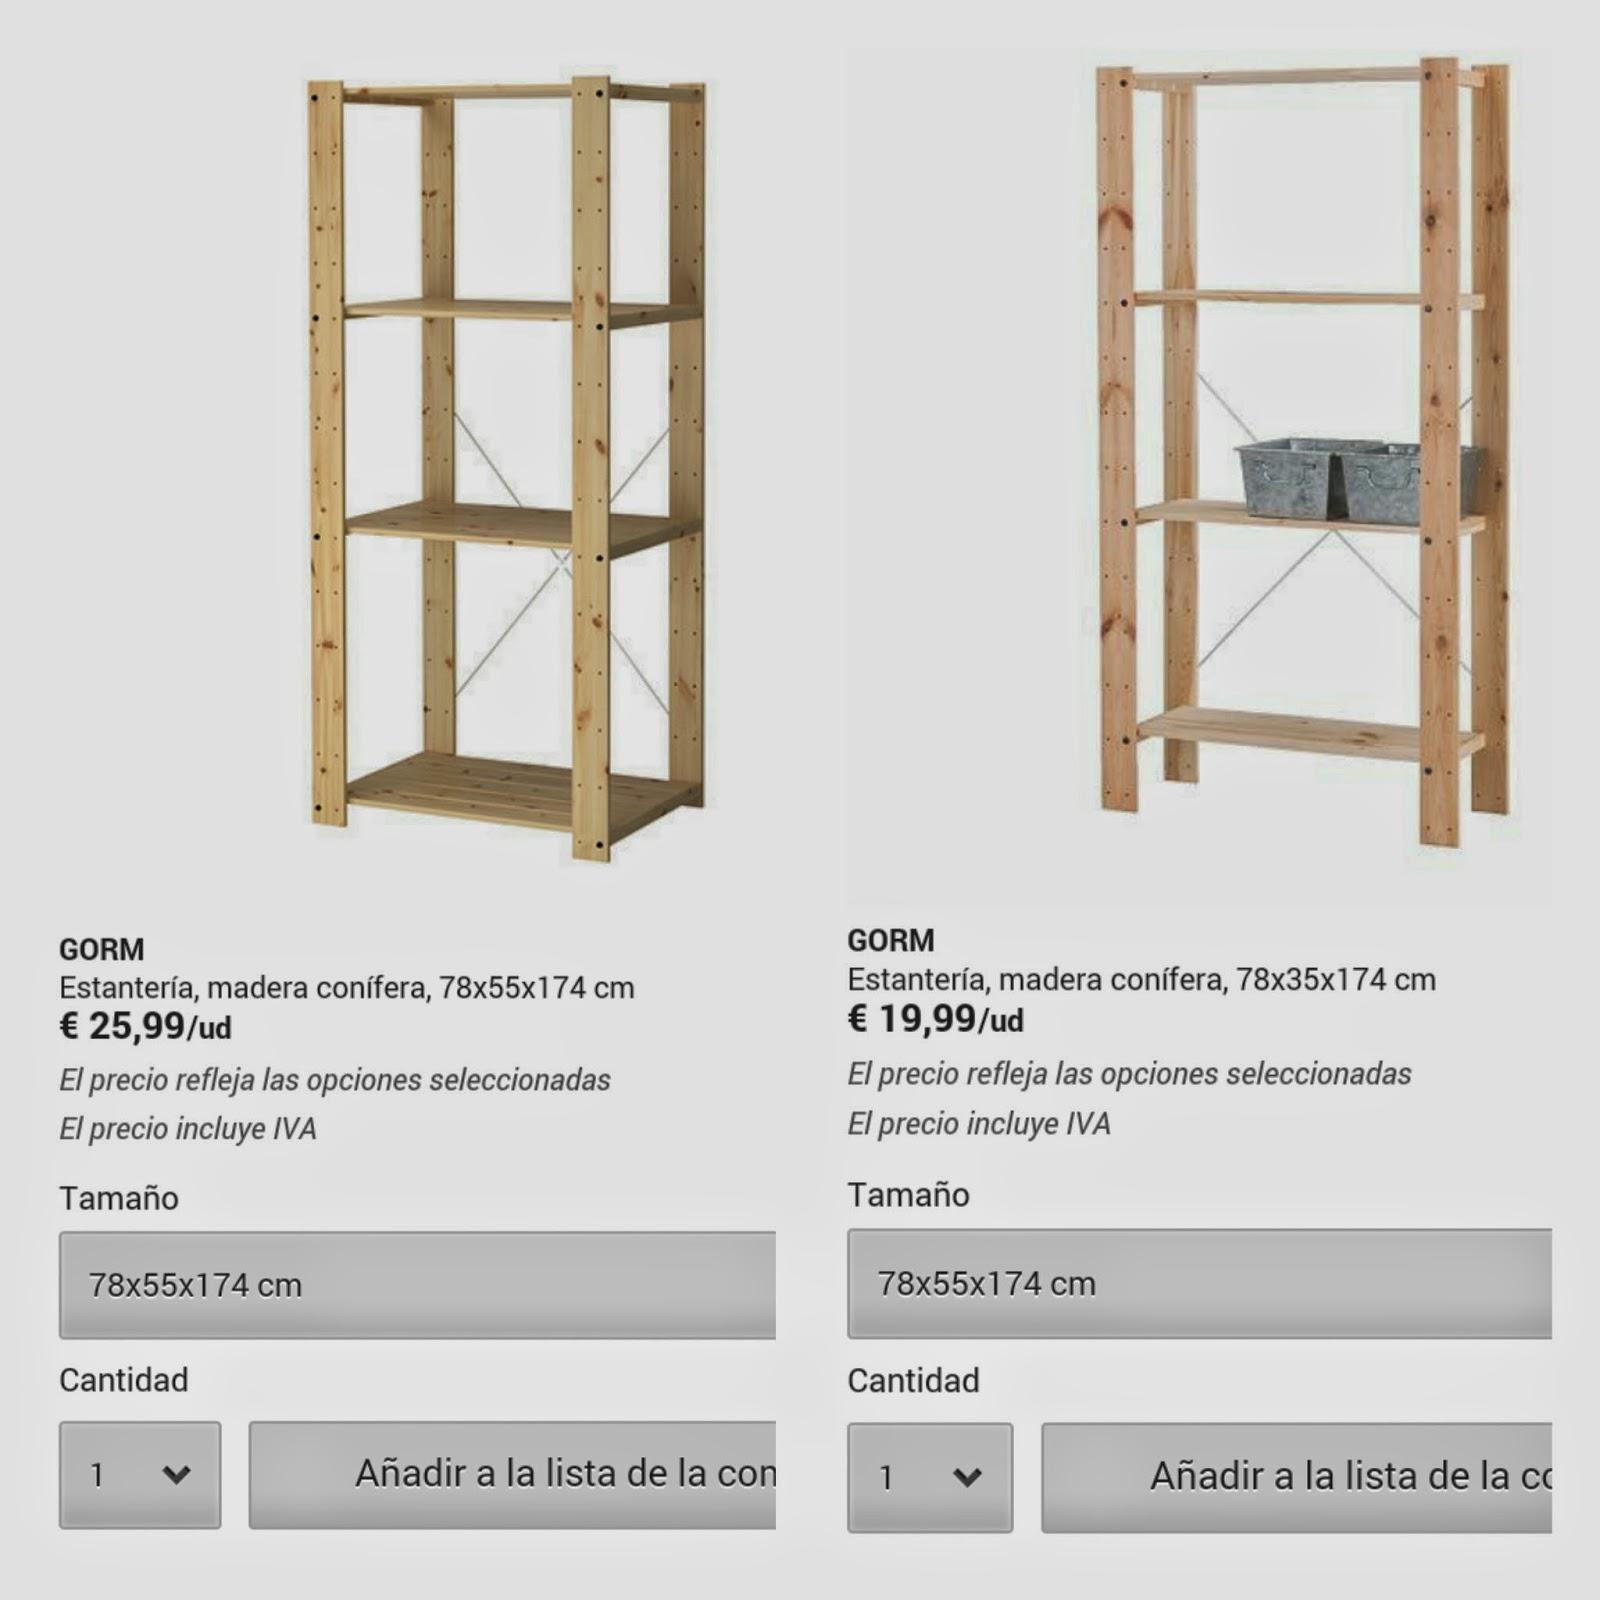 Estanteria de madera ikea great ikeaps estantera de for Ikea puertas para estanterias